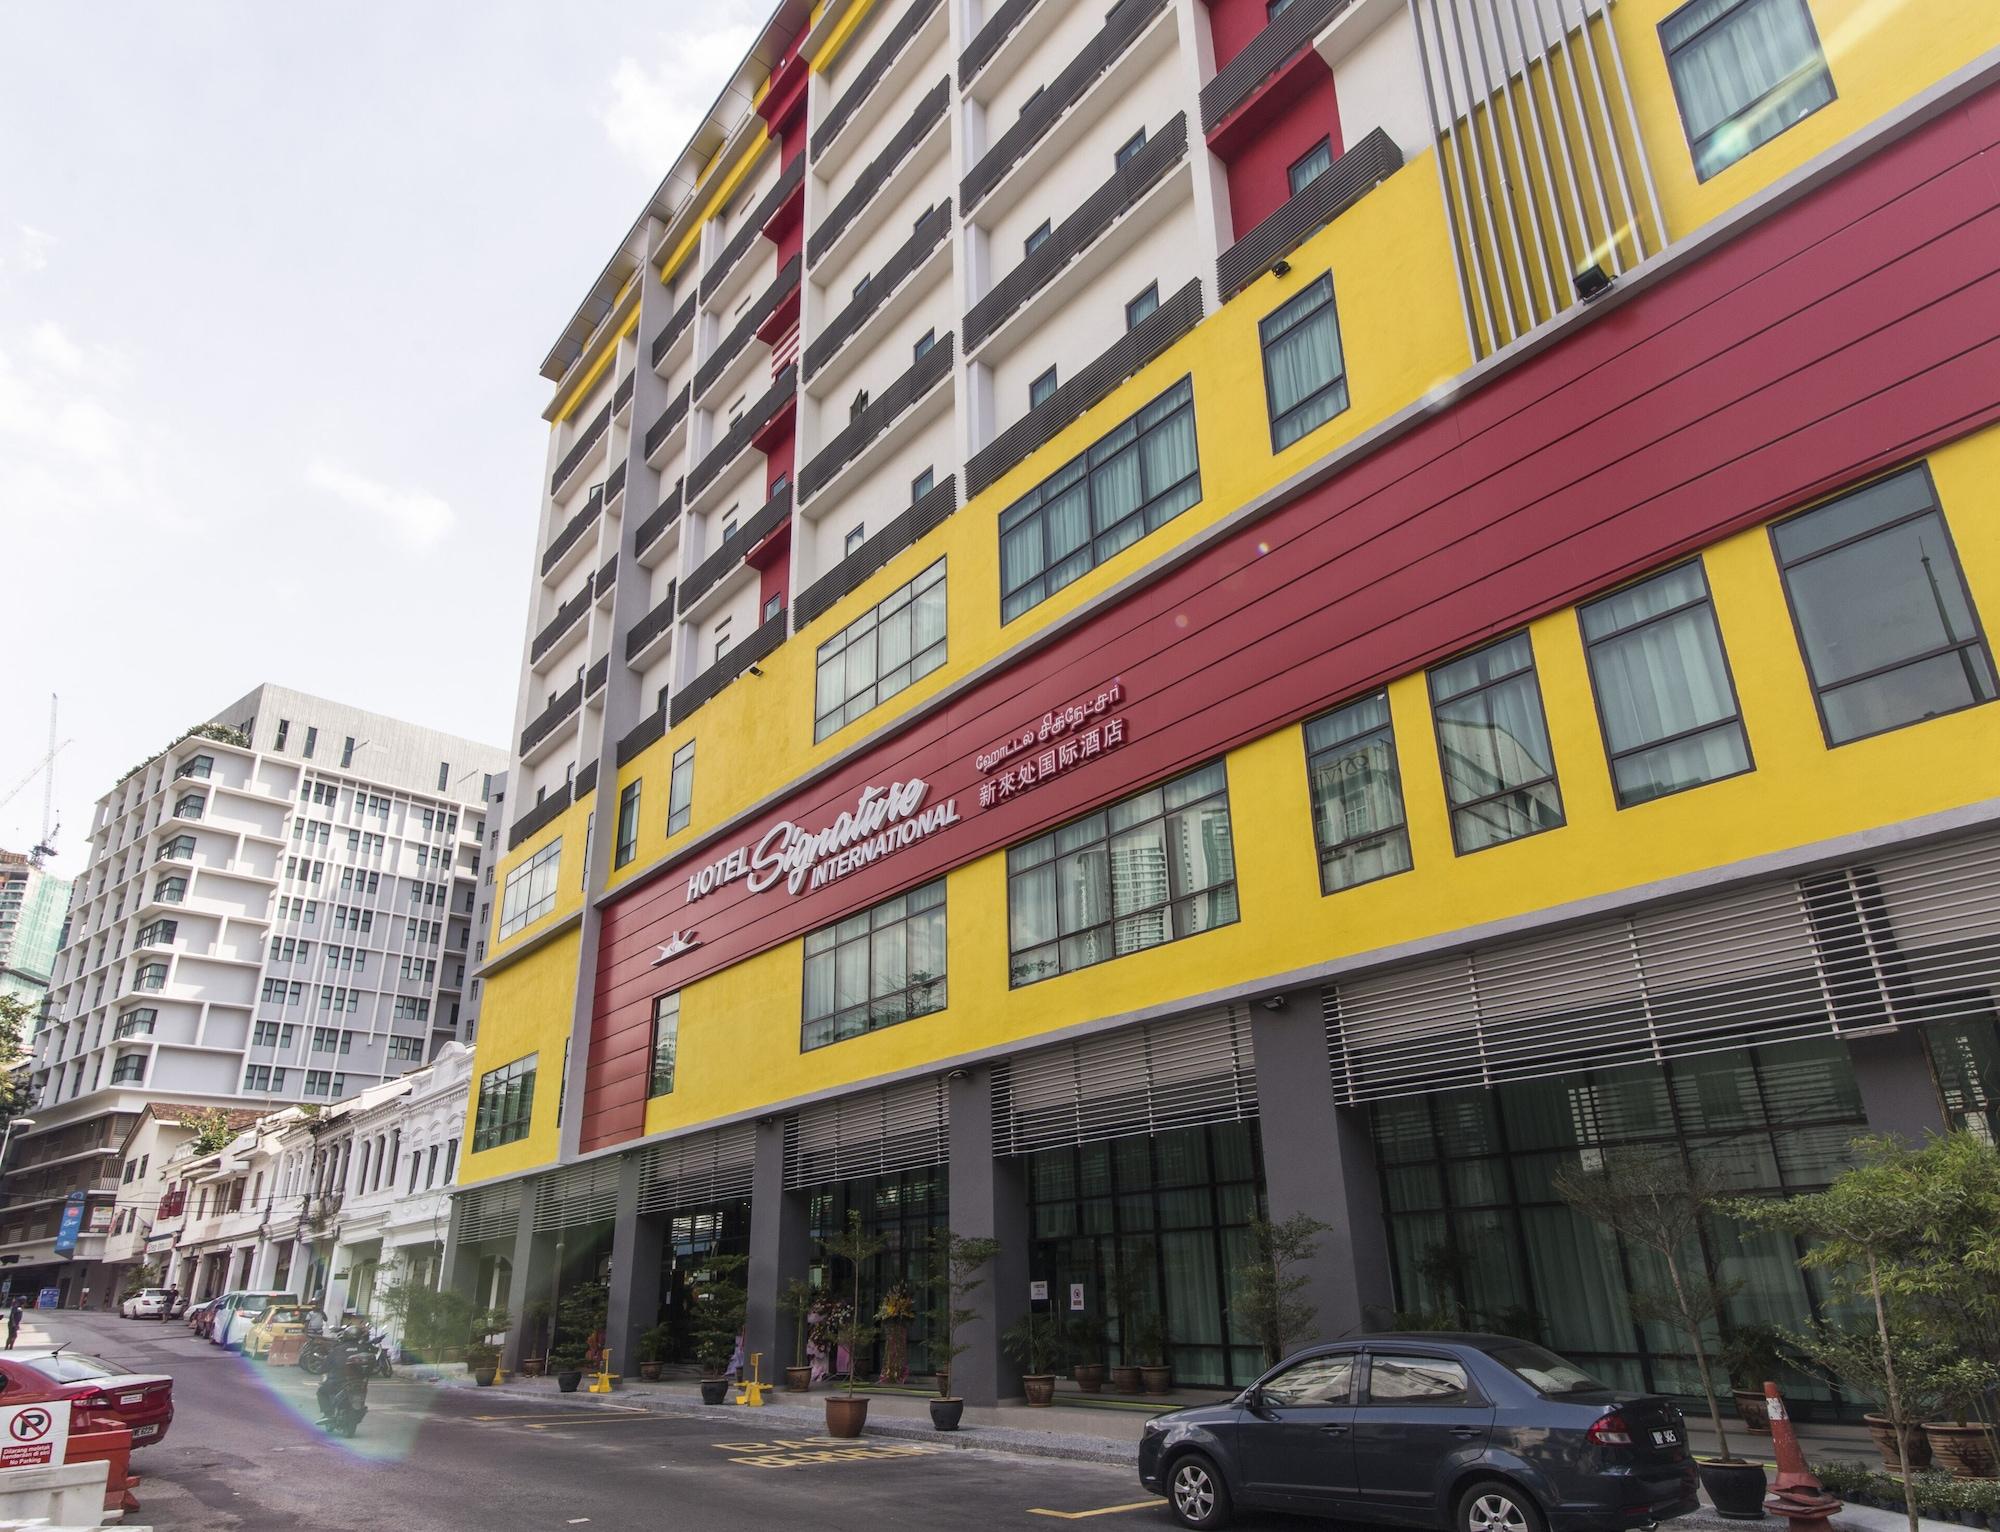 Hotel Signature International at Pudu, Kuala Lumpur